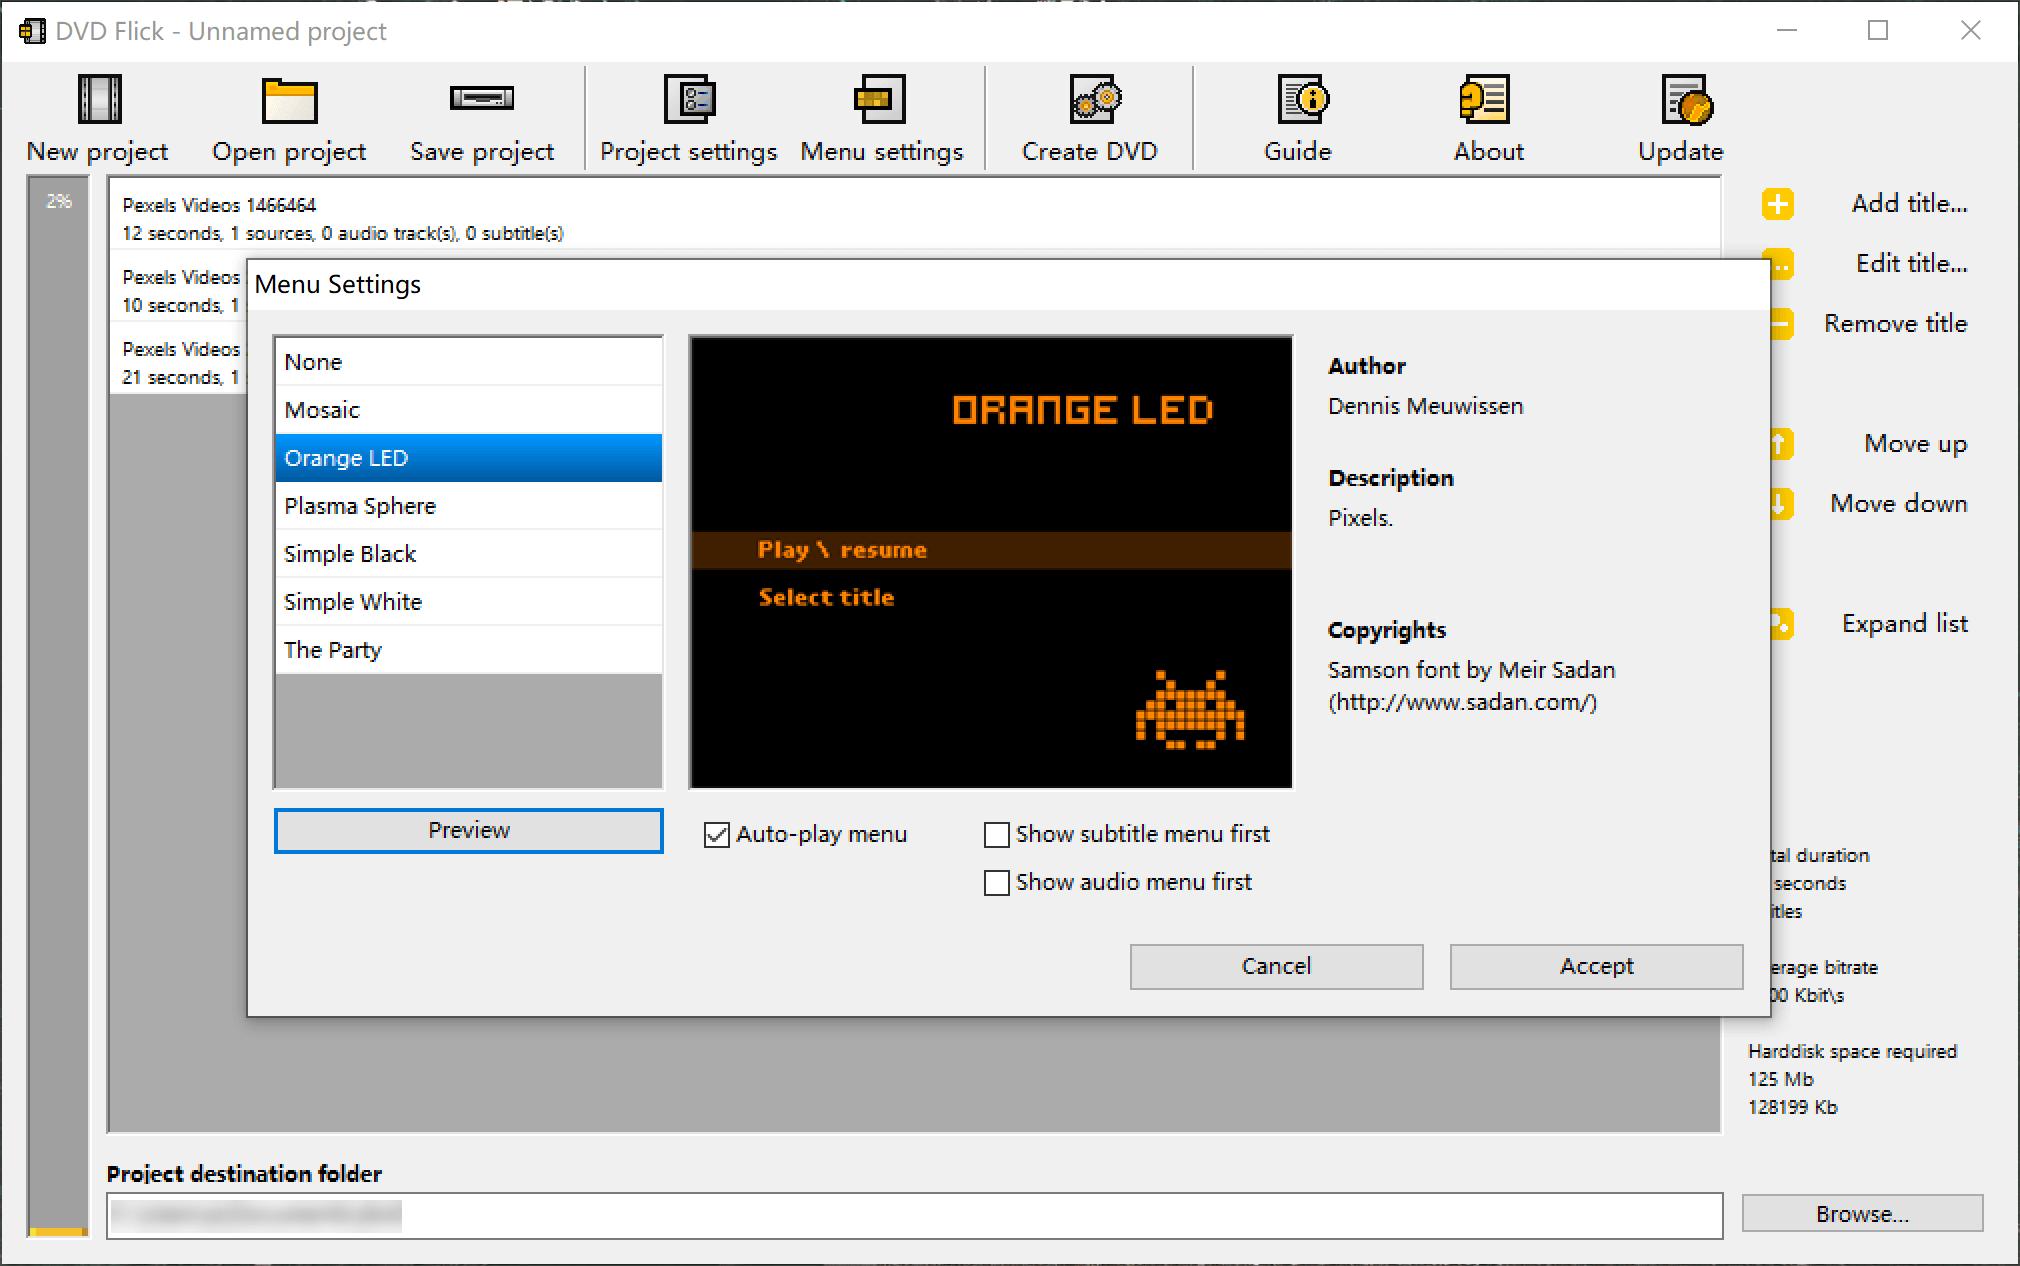 DVD Flickを使ってDVDに変換する